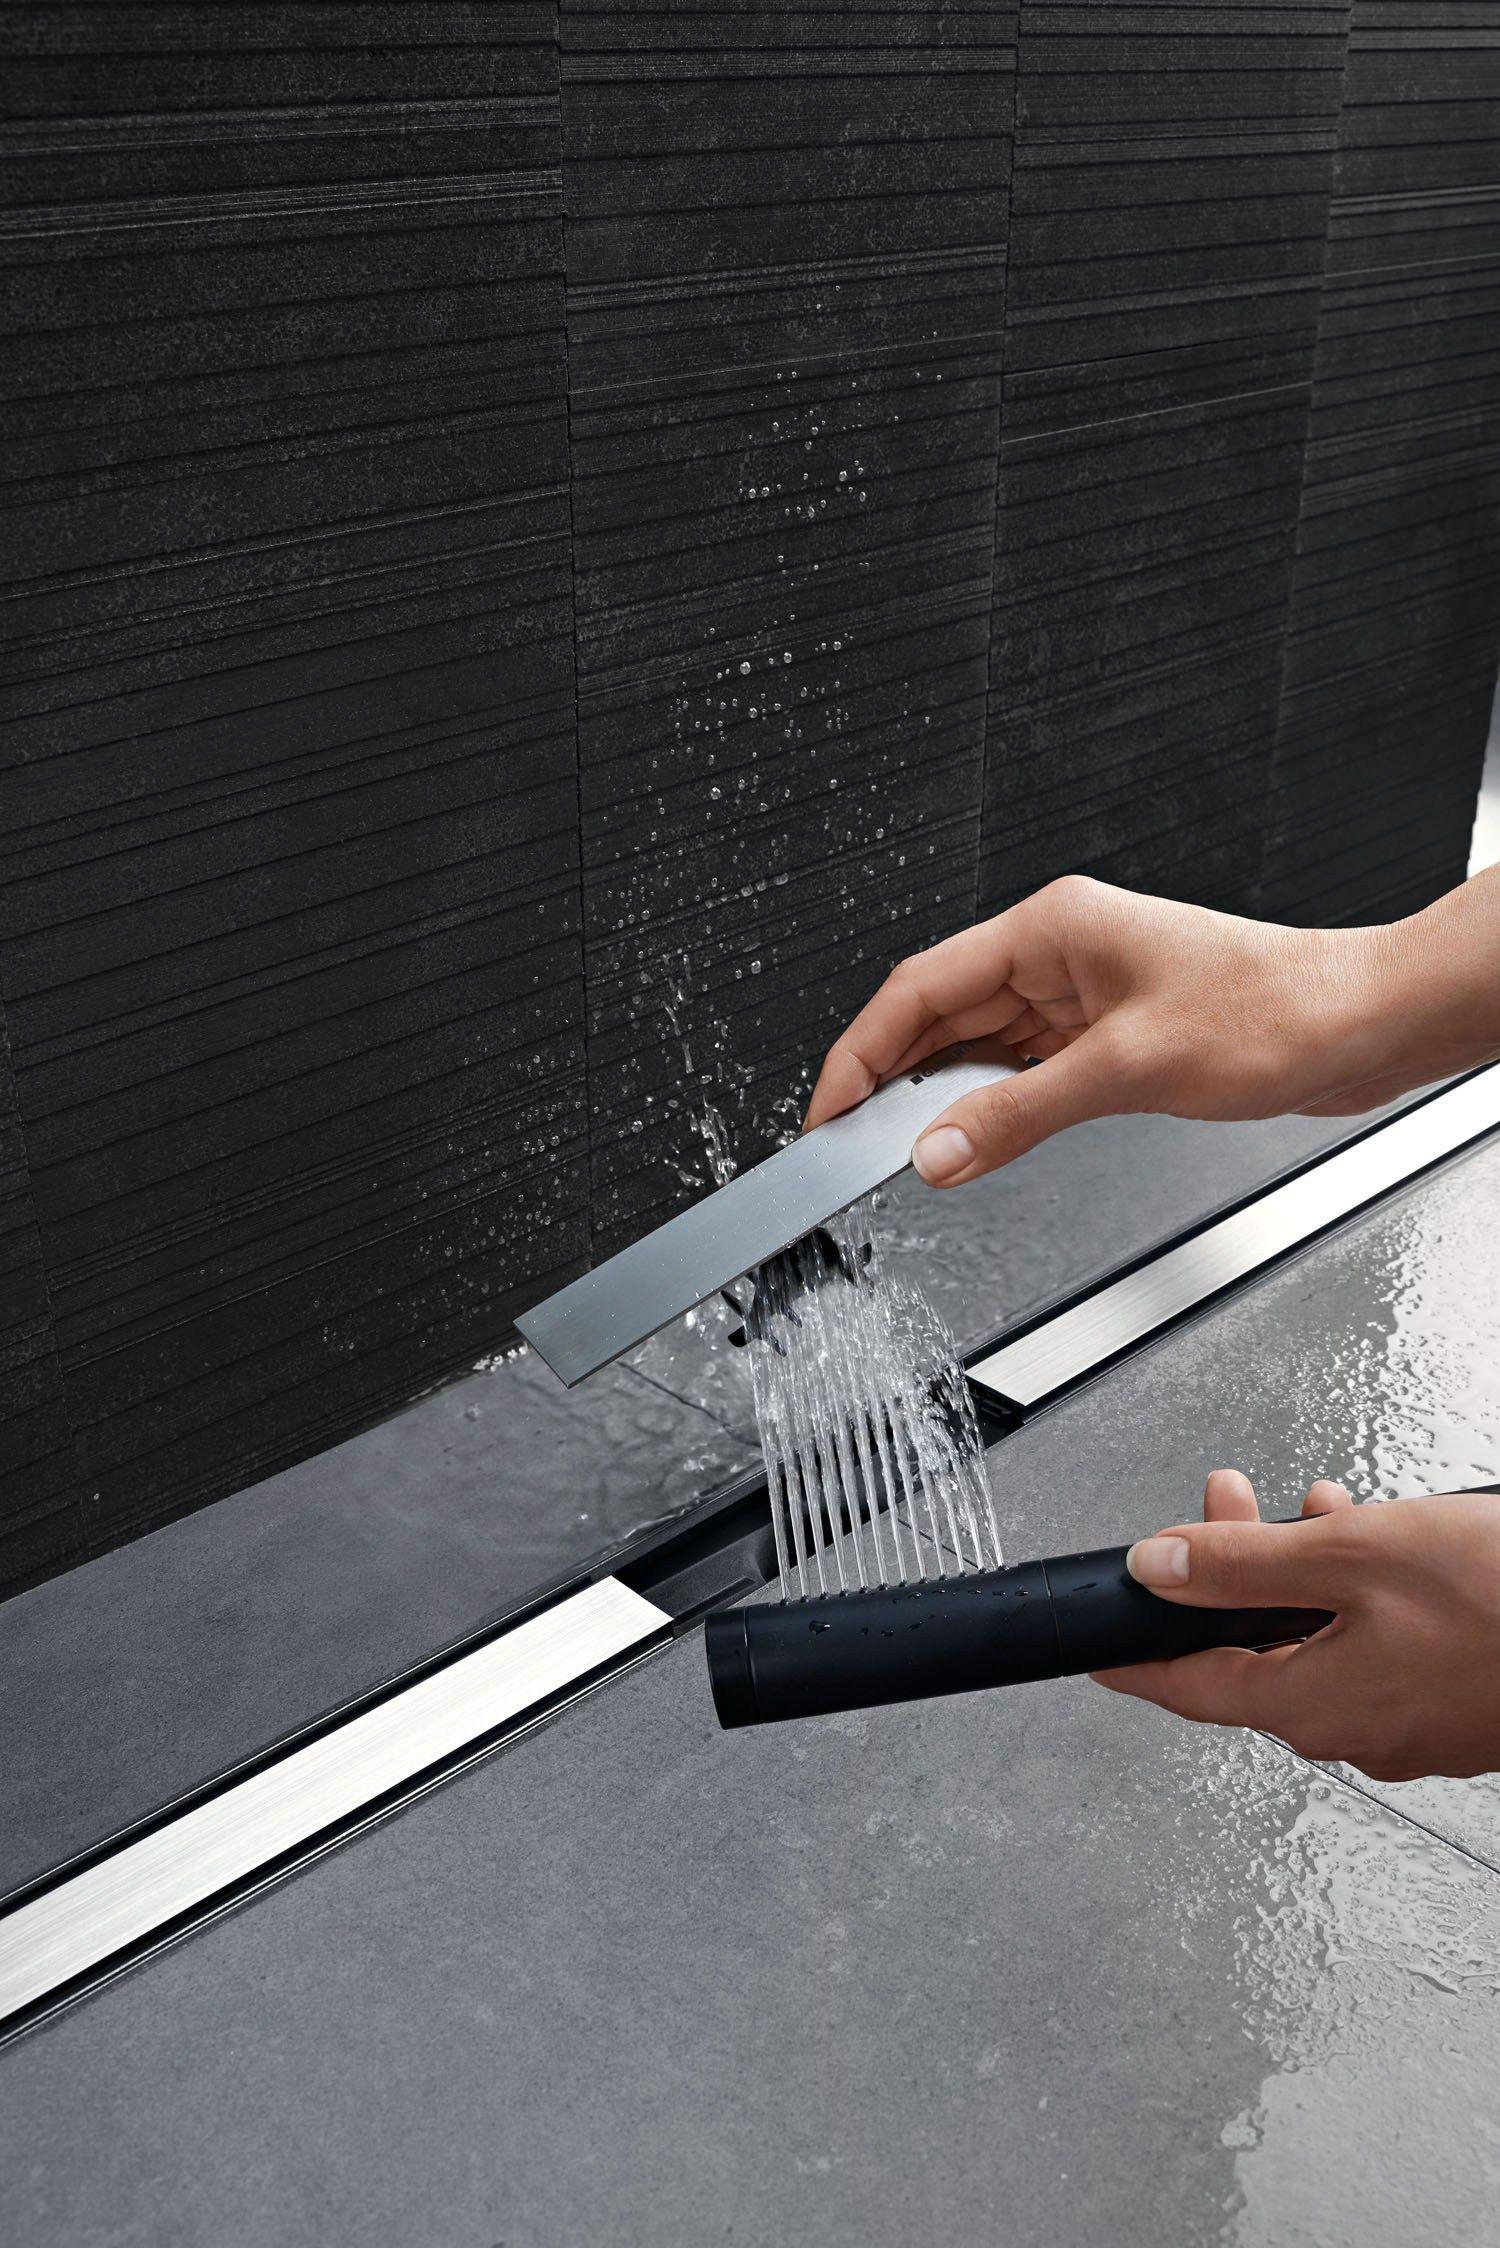 Steel Shower Channel Cleanline By Geberit Italia Shower Drains Shower Drain Shower